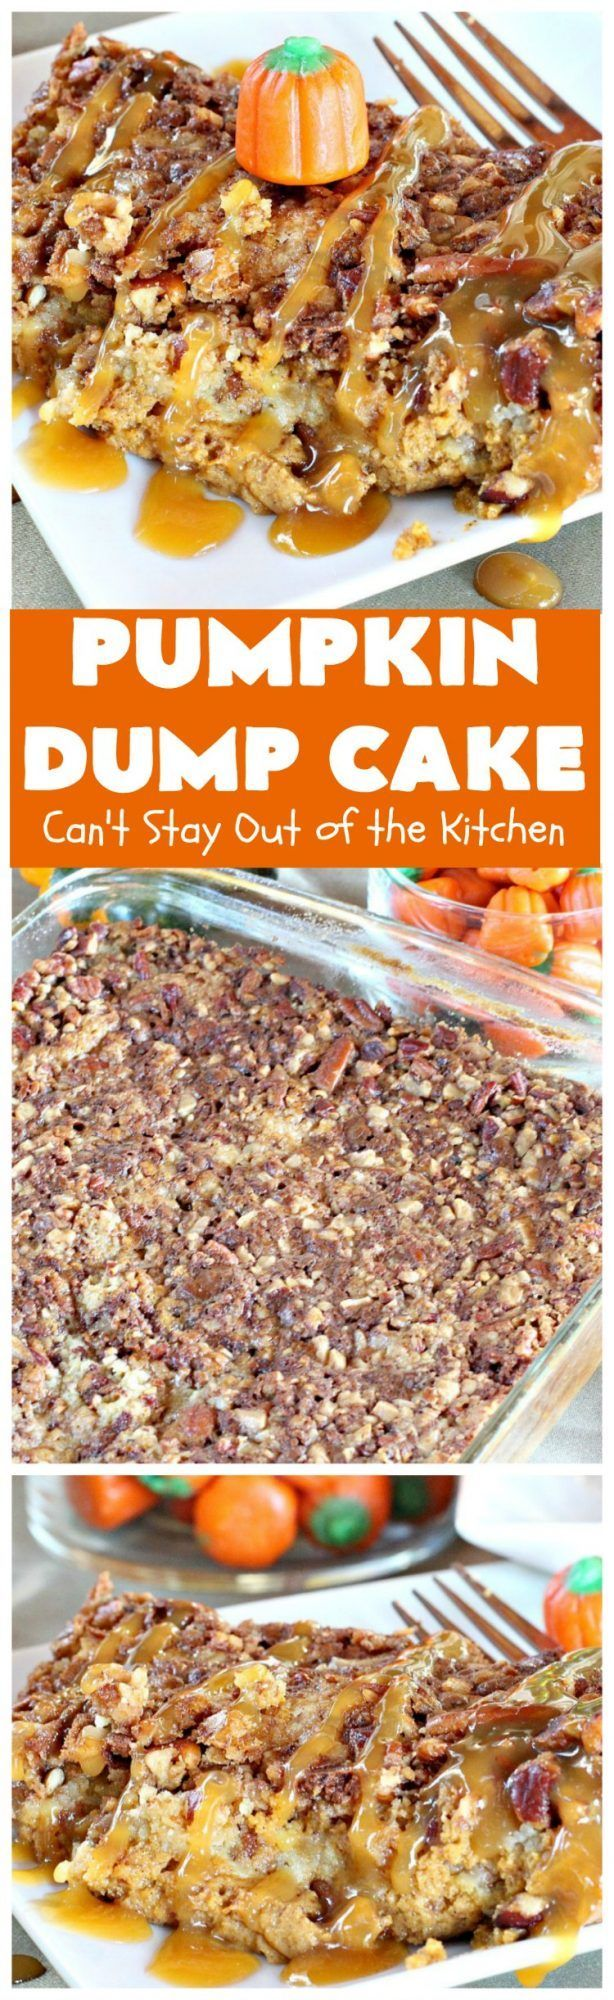 Good tweak on the Kick Ass Pumpkin Pie Cake recipe.